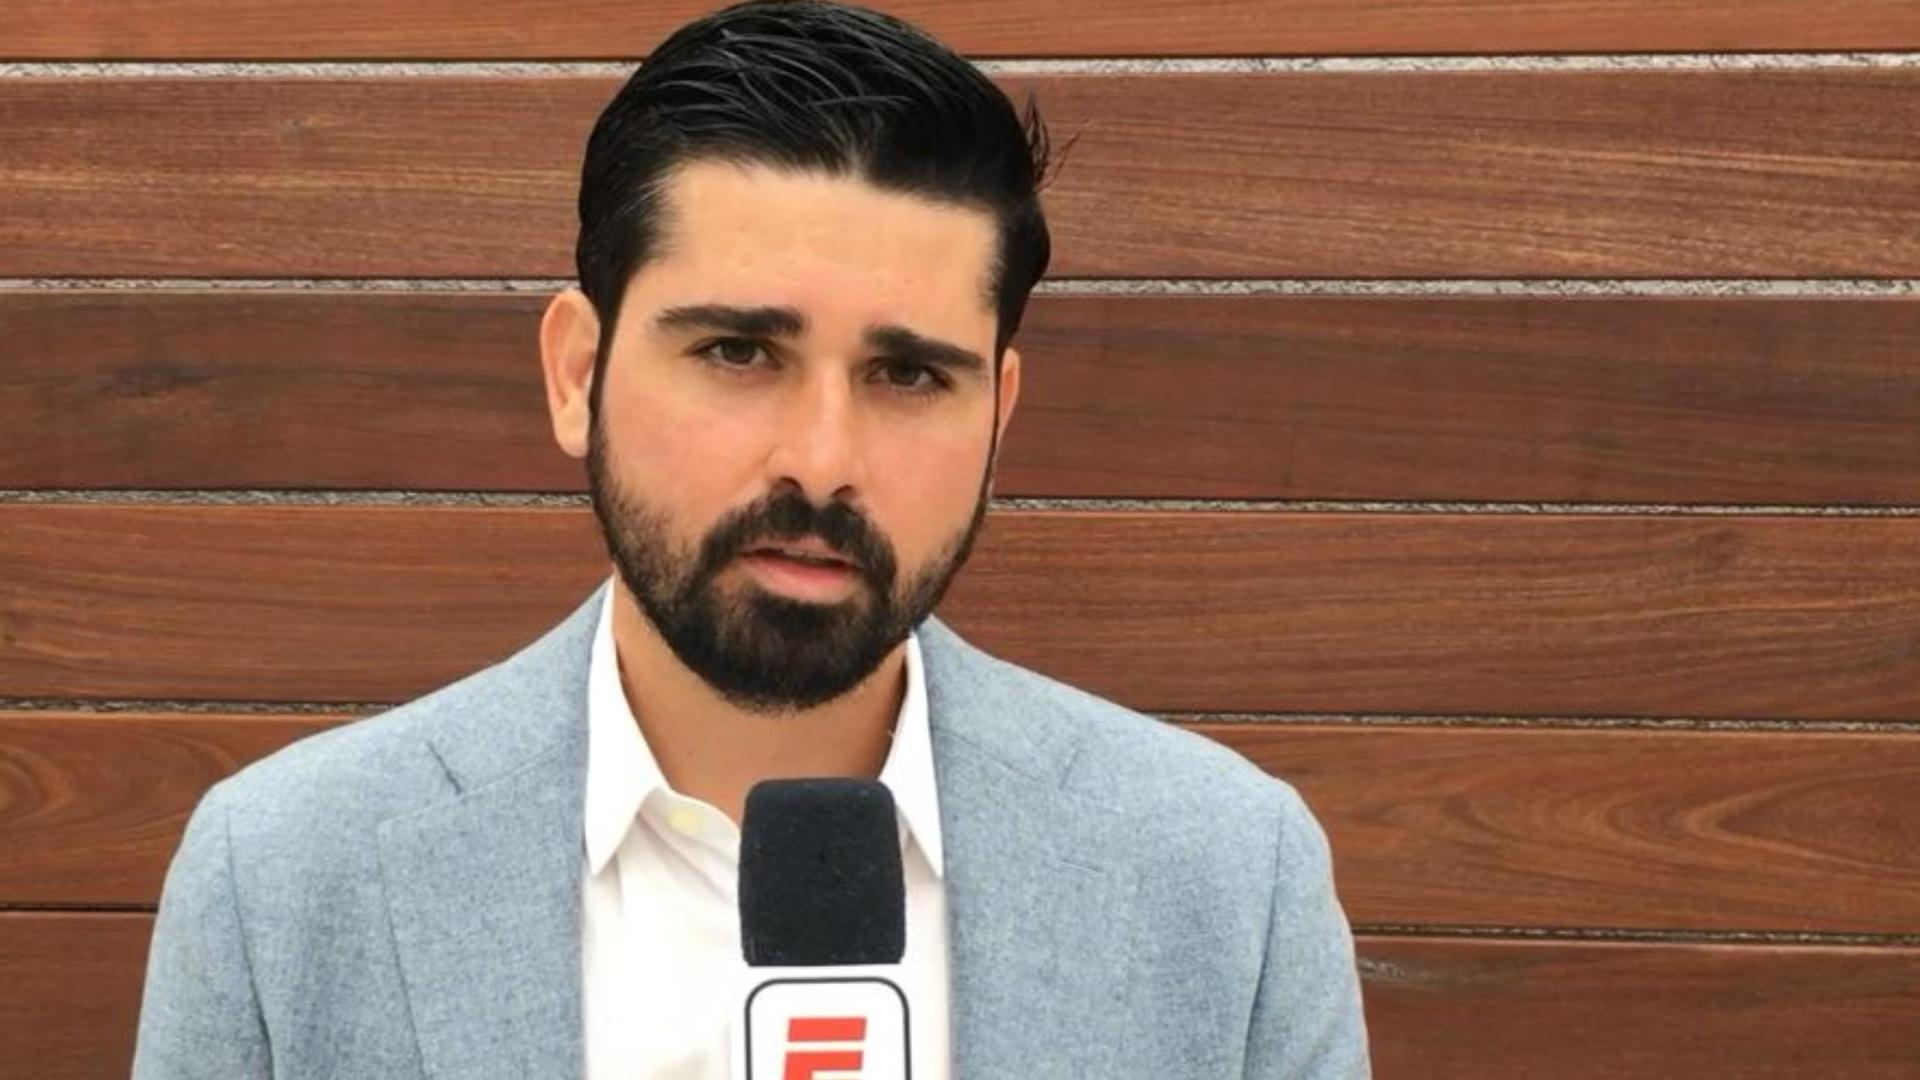 Venezuelan minor leaguers impacted by coronavirus